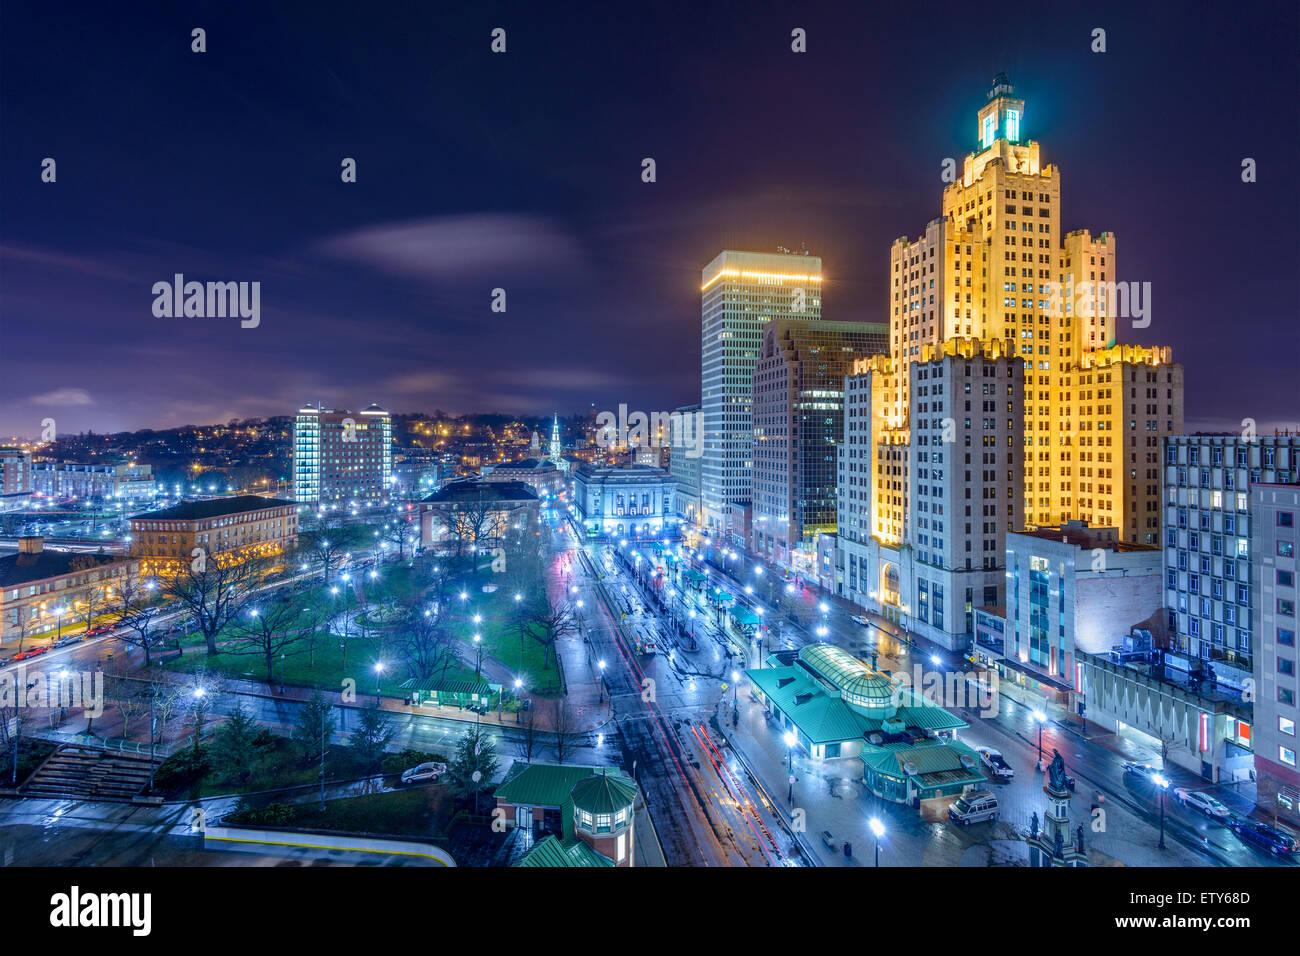 Providence, Rhode Island, USA cityscape at night. - Stock Image